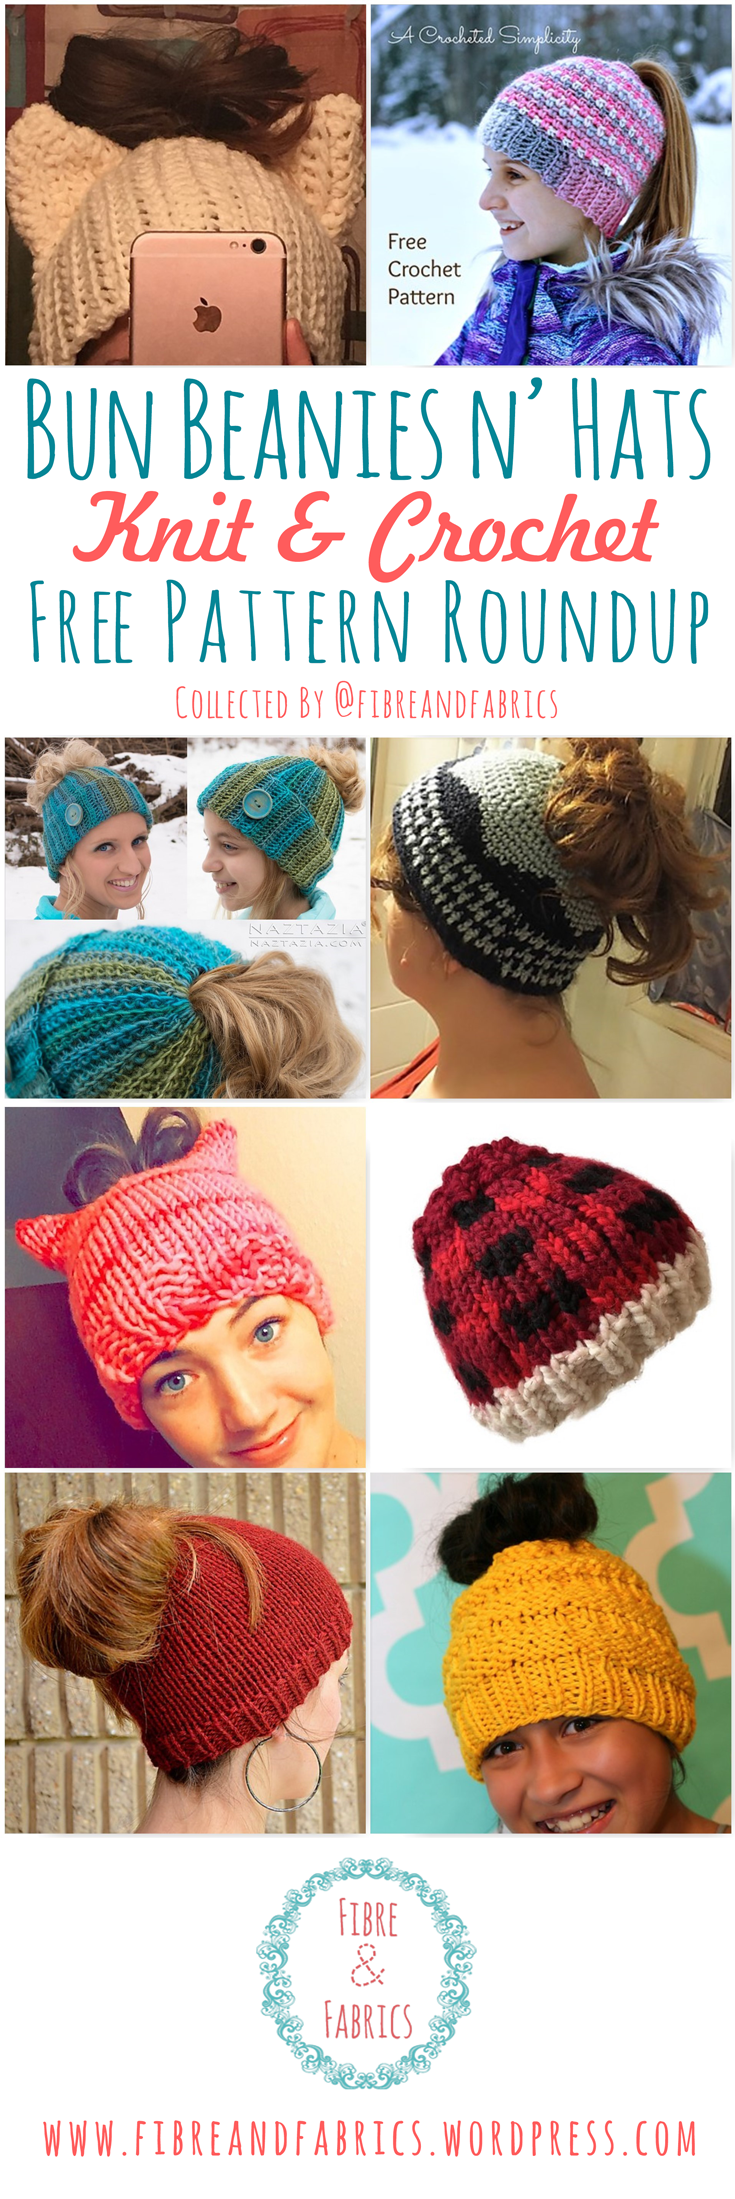 10+ FREE Bun Beanie Knitting & Crochet Pattern Roundup by @fibreandfabrics